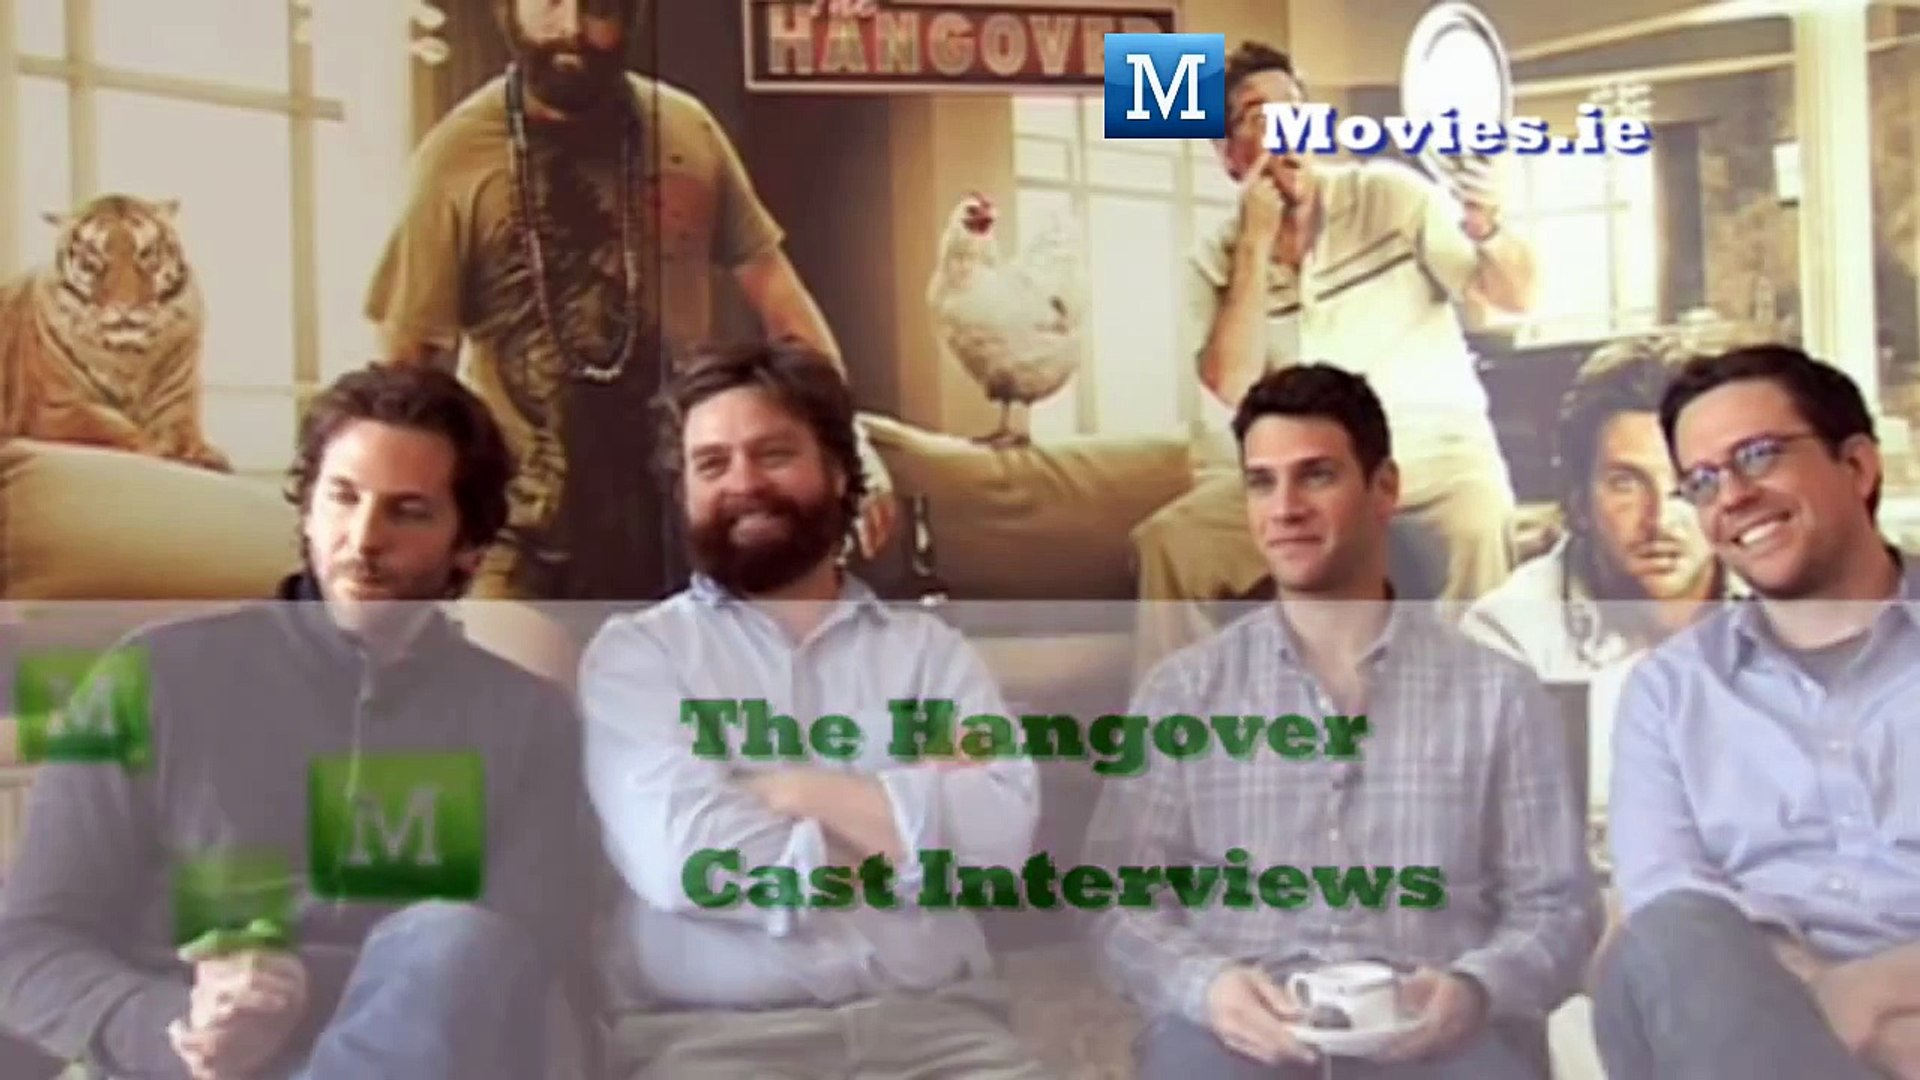 The Hangover - Cast Interviews, Bradley Cooper, Justin Bartha, Zacg Galifianakis Ed Helms